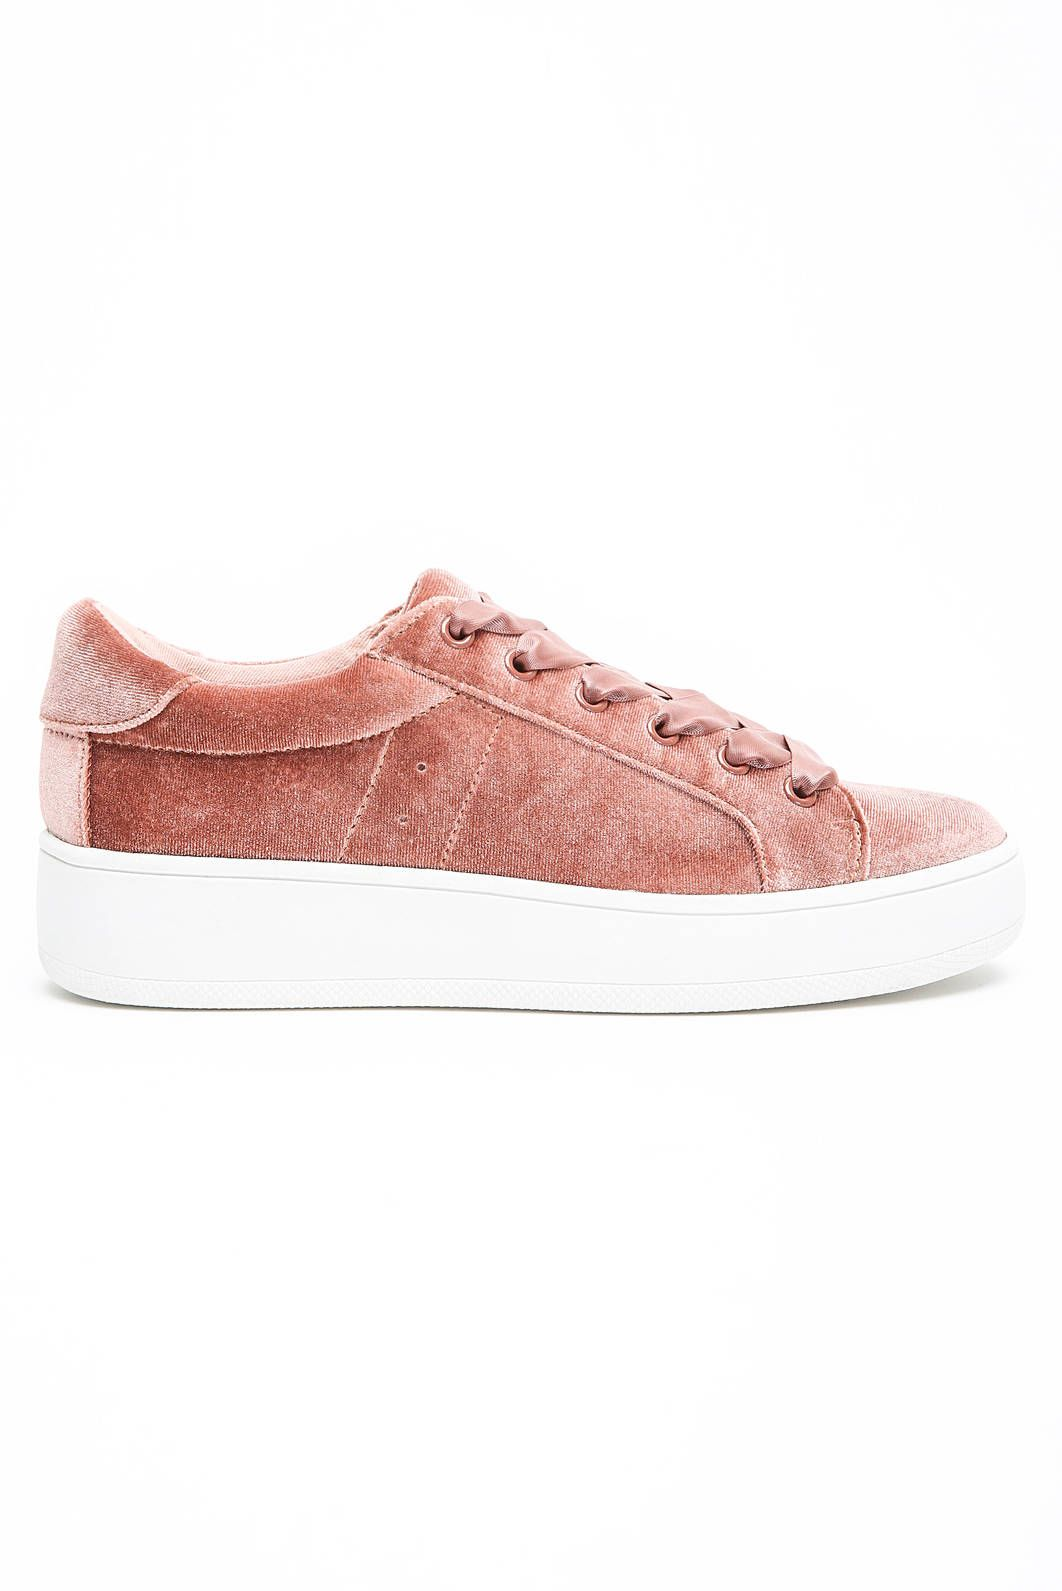 979b9620f17 Steve Madden Bertiev Velvet Lace Up Sneakers in PINK